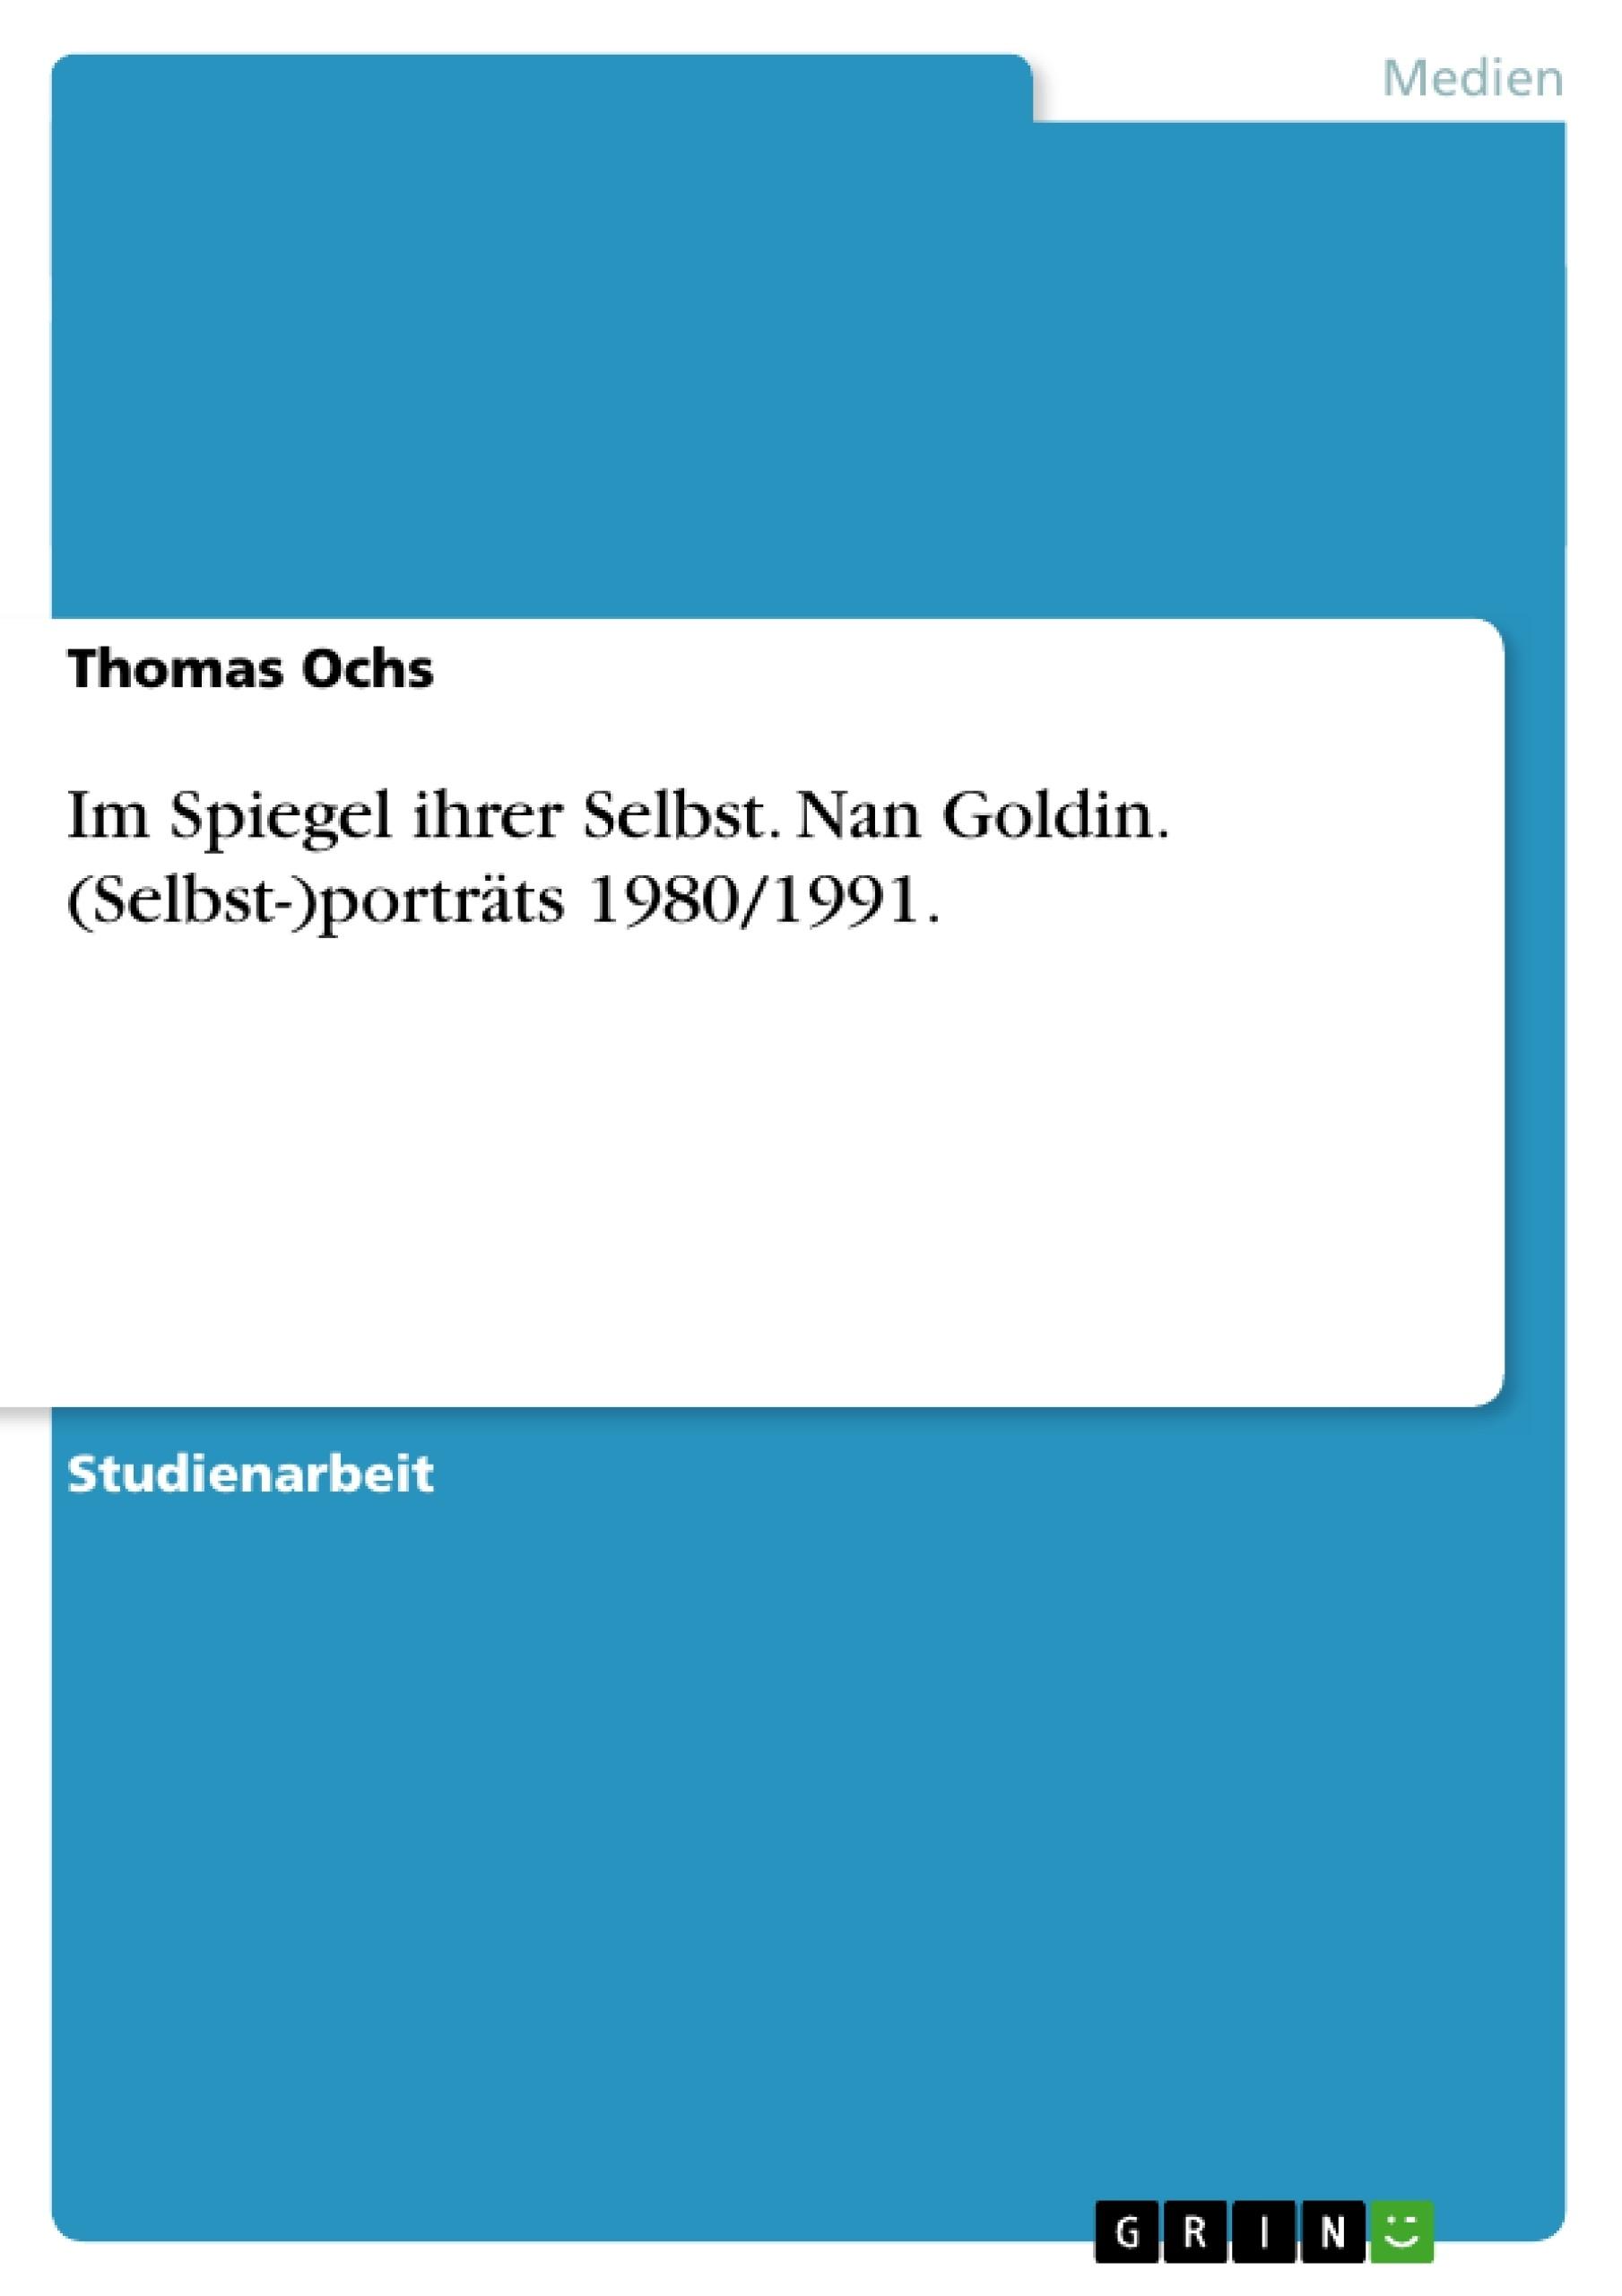 Titel: Im Spiegel ihrer Selbst. Nan Goldin. (Selbst-)porträts 1980/1991.